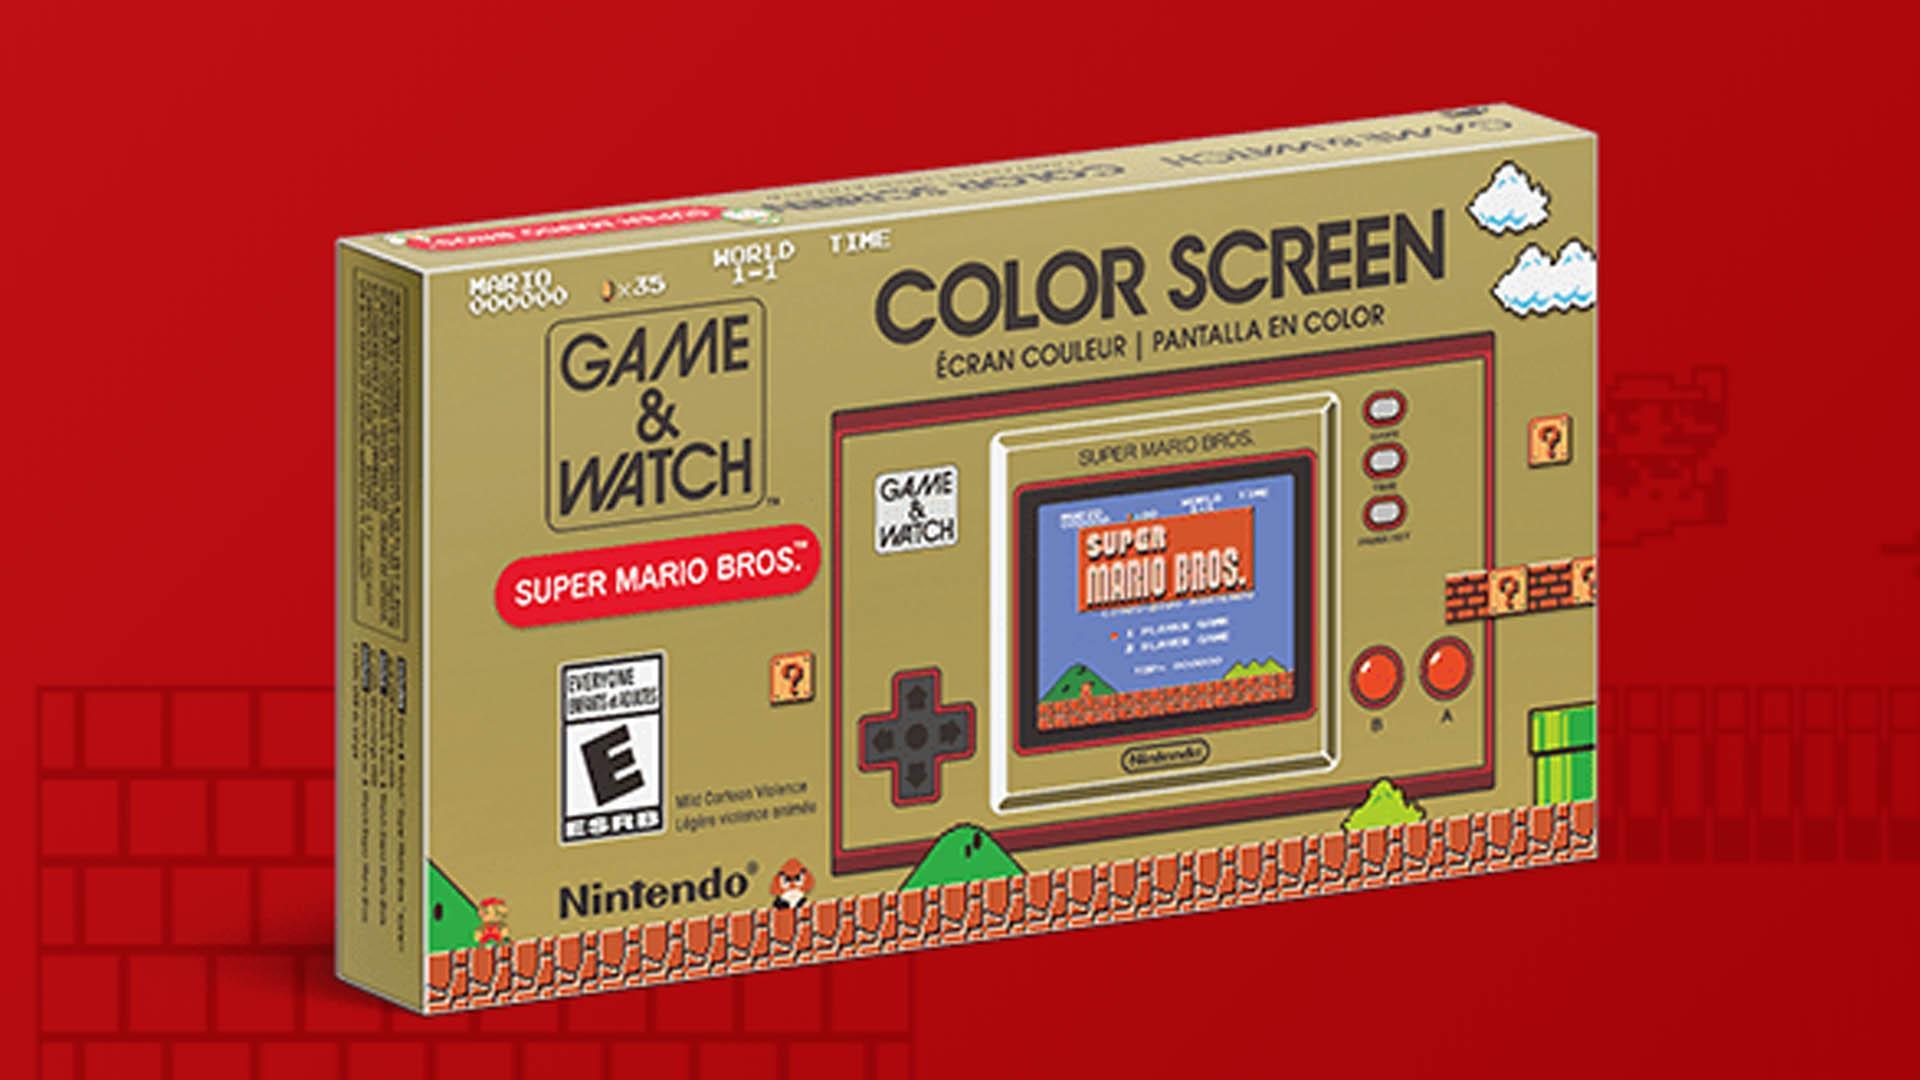 Game & Watch: Super Mario Bros. Nouvelle Console Portable